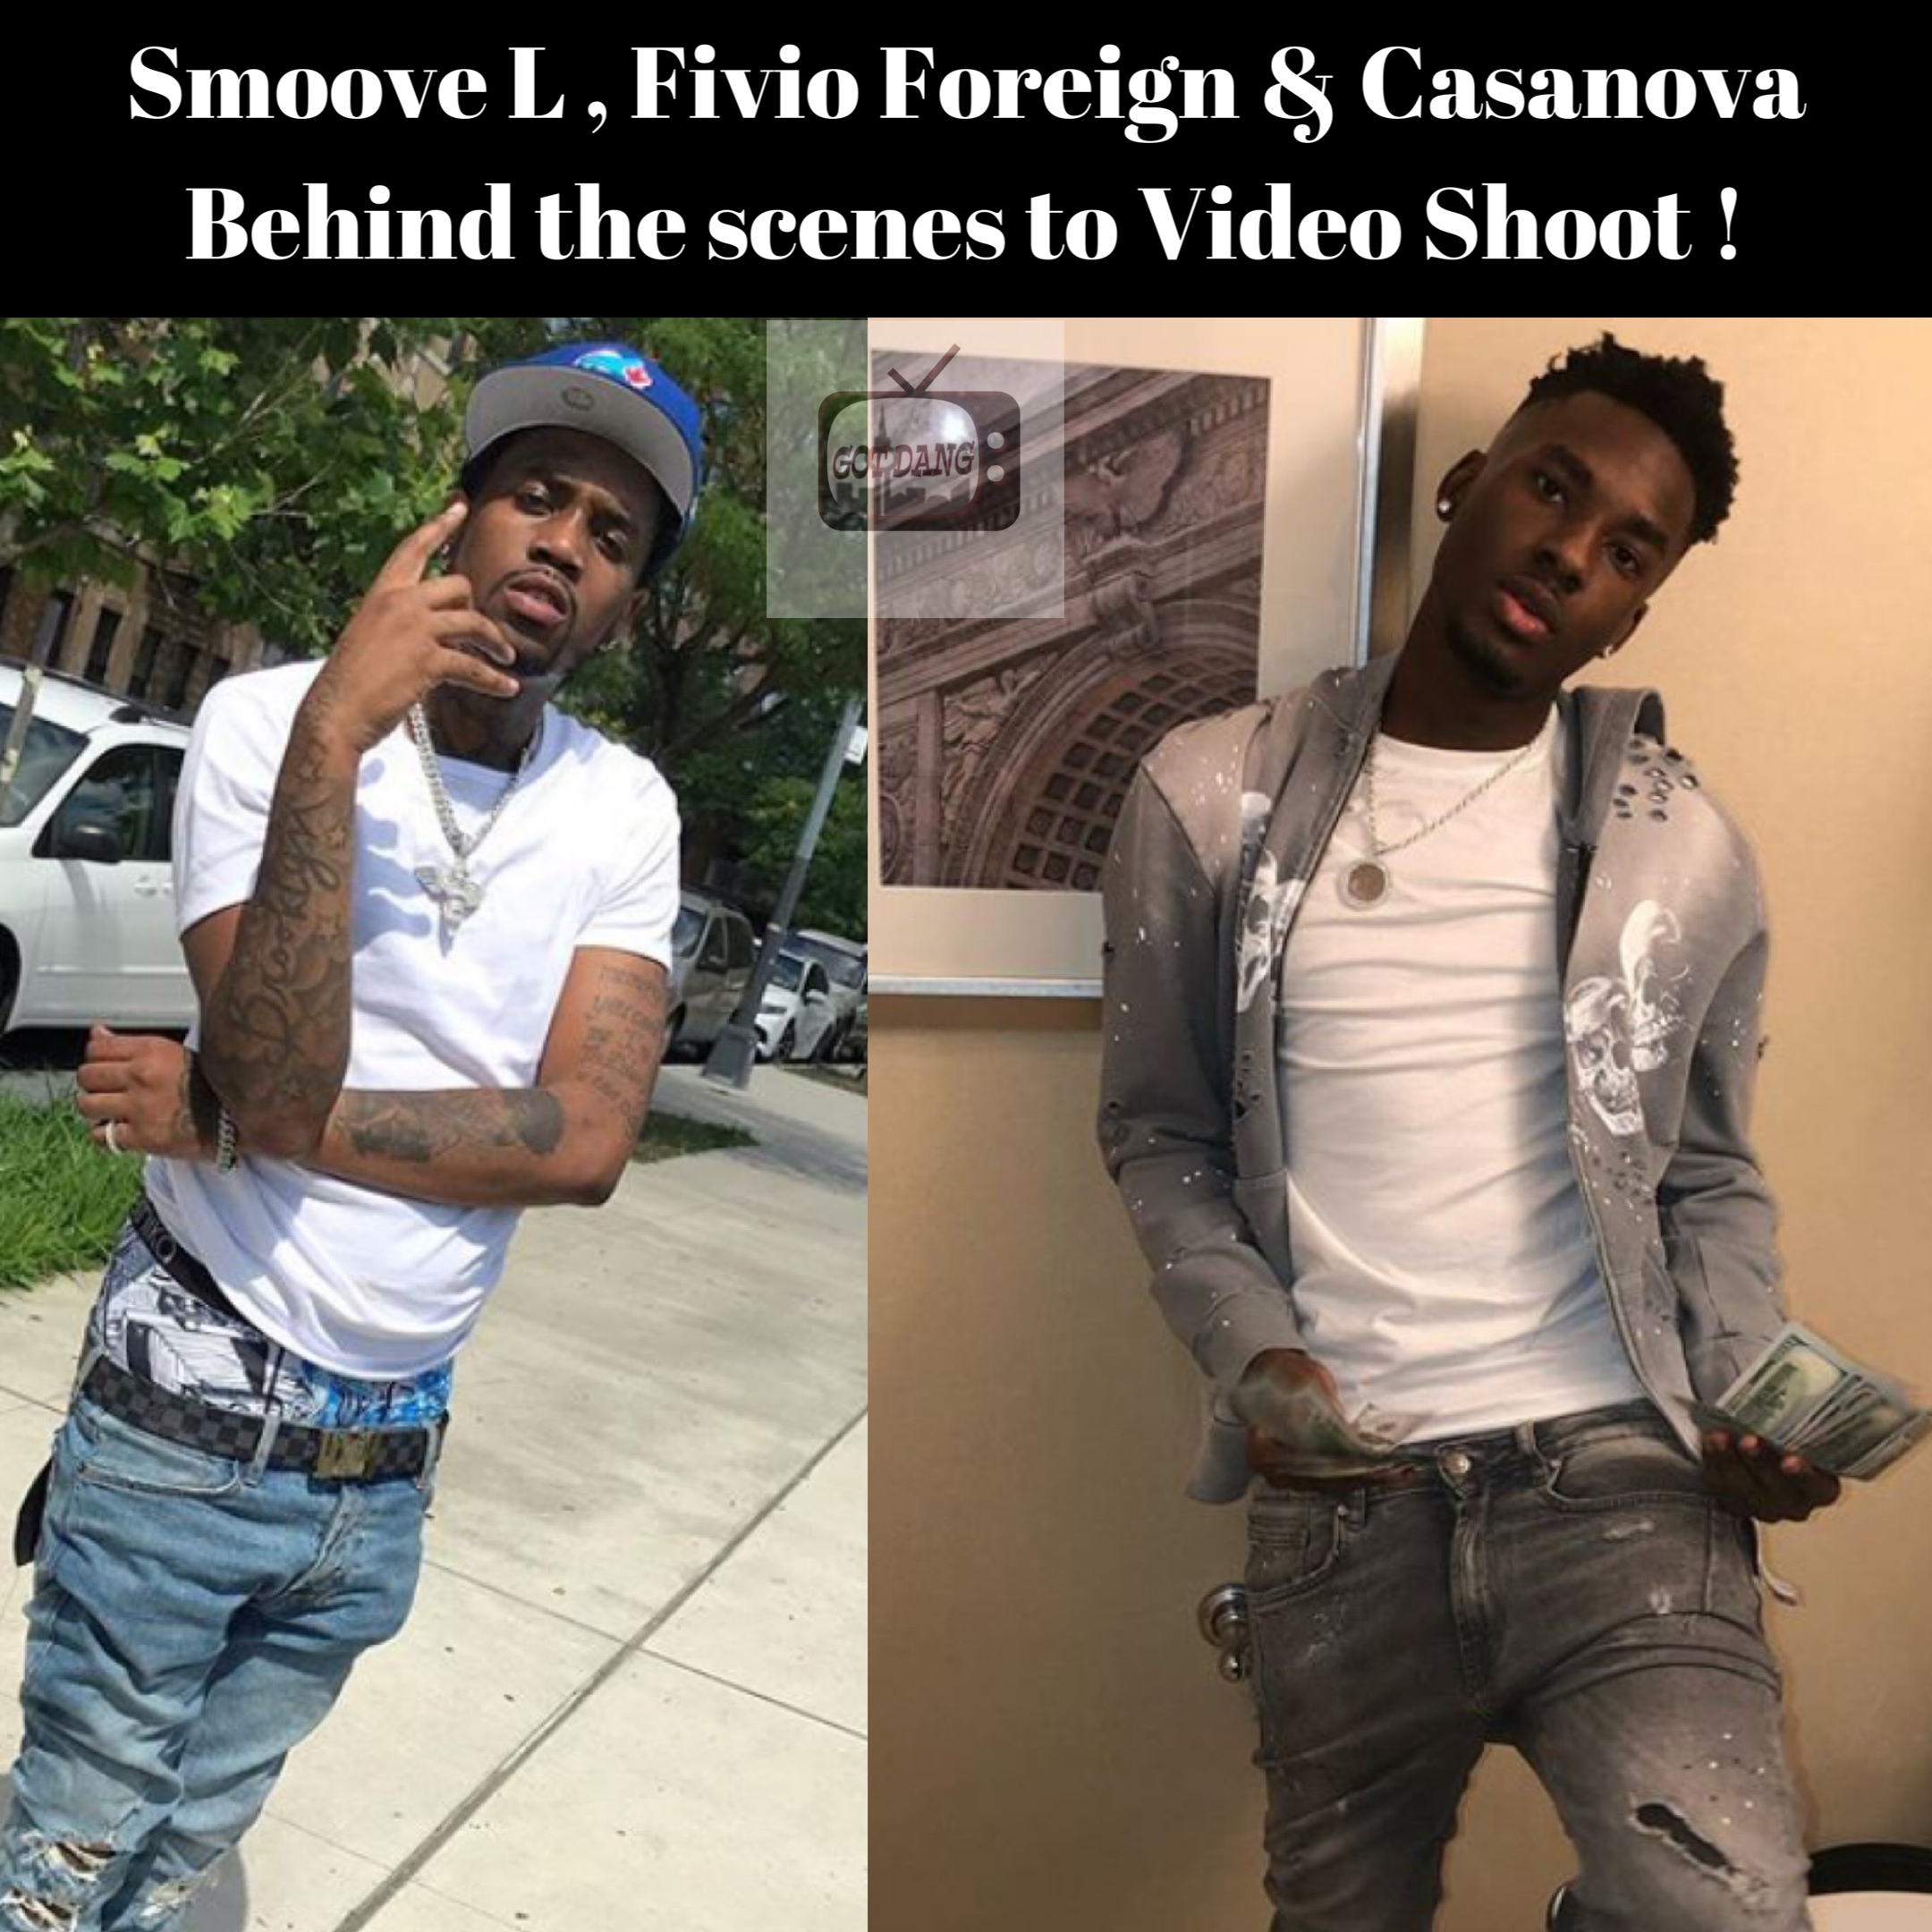 Smoove L , Fivio Foreign , & Casanova Shooting Video